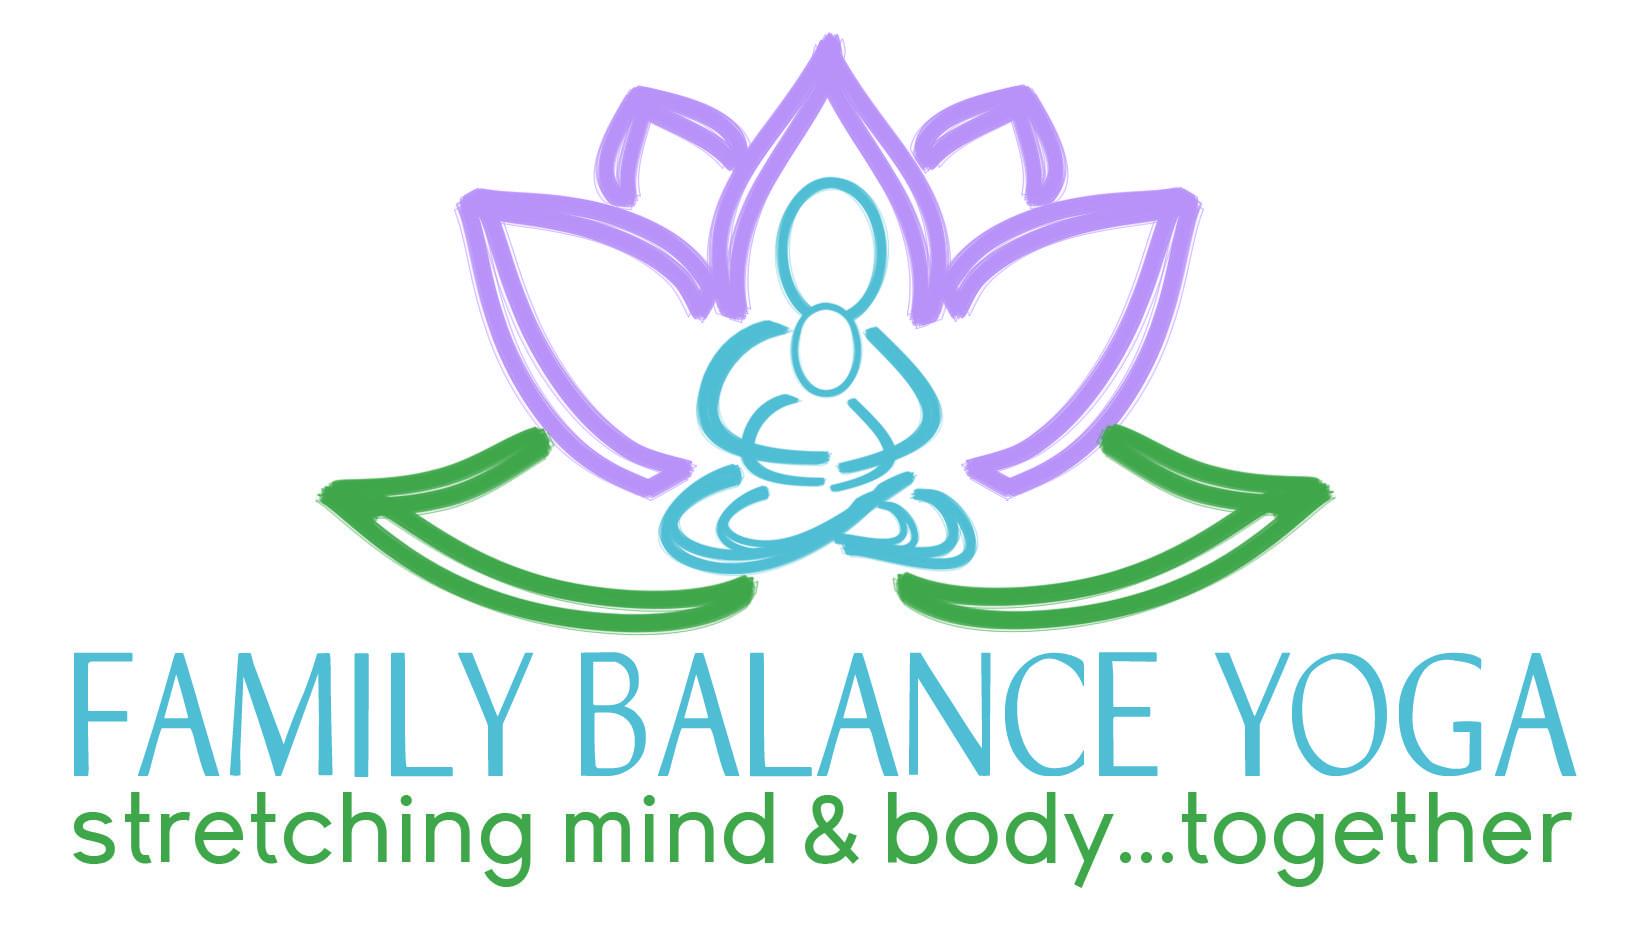 Family Balance Yoga logo